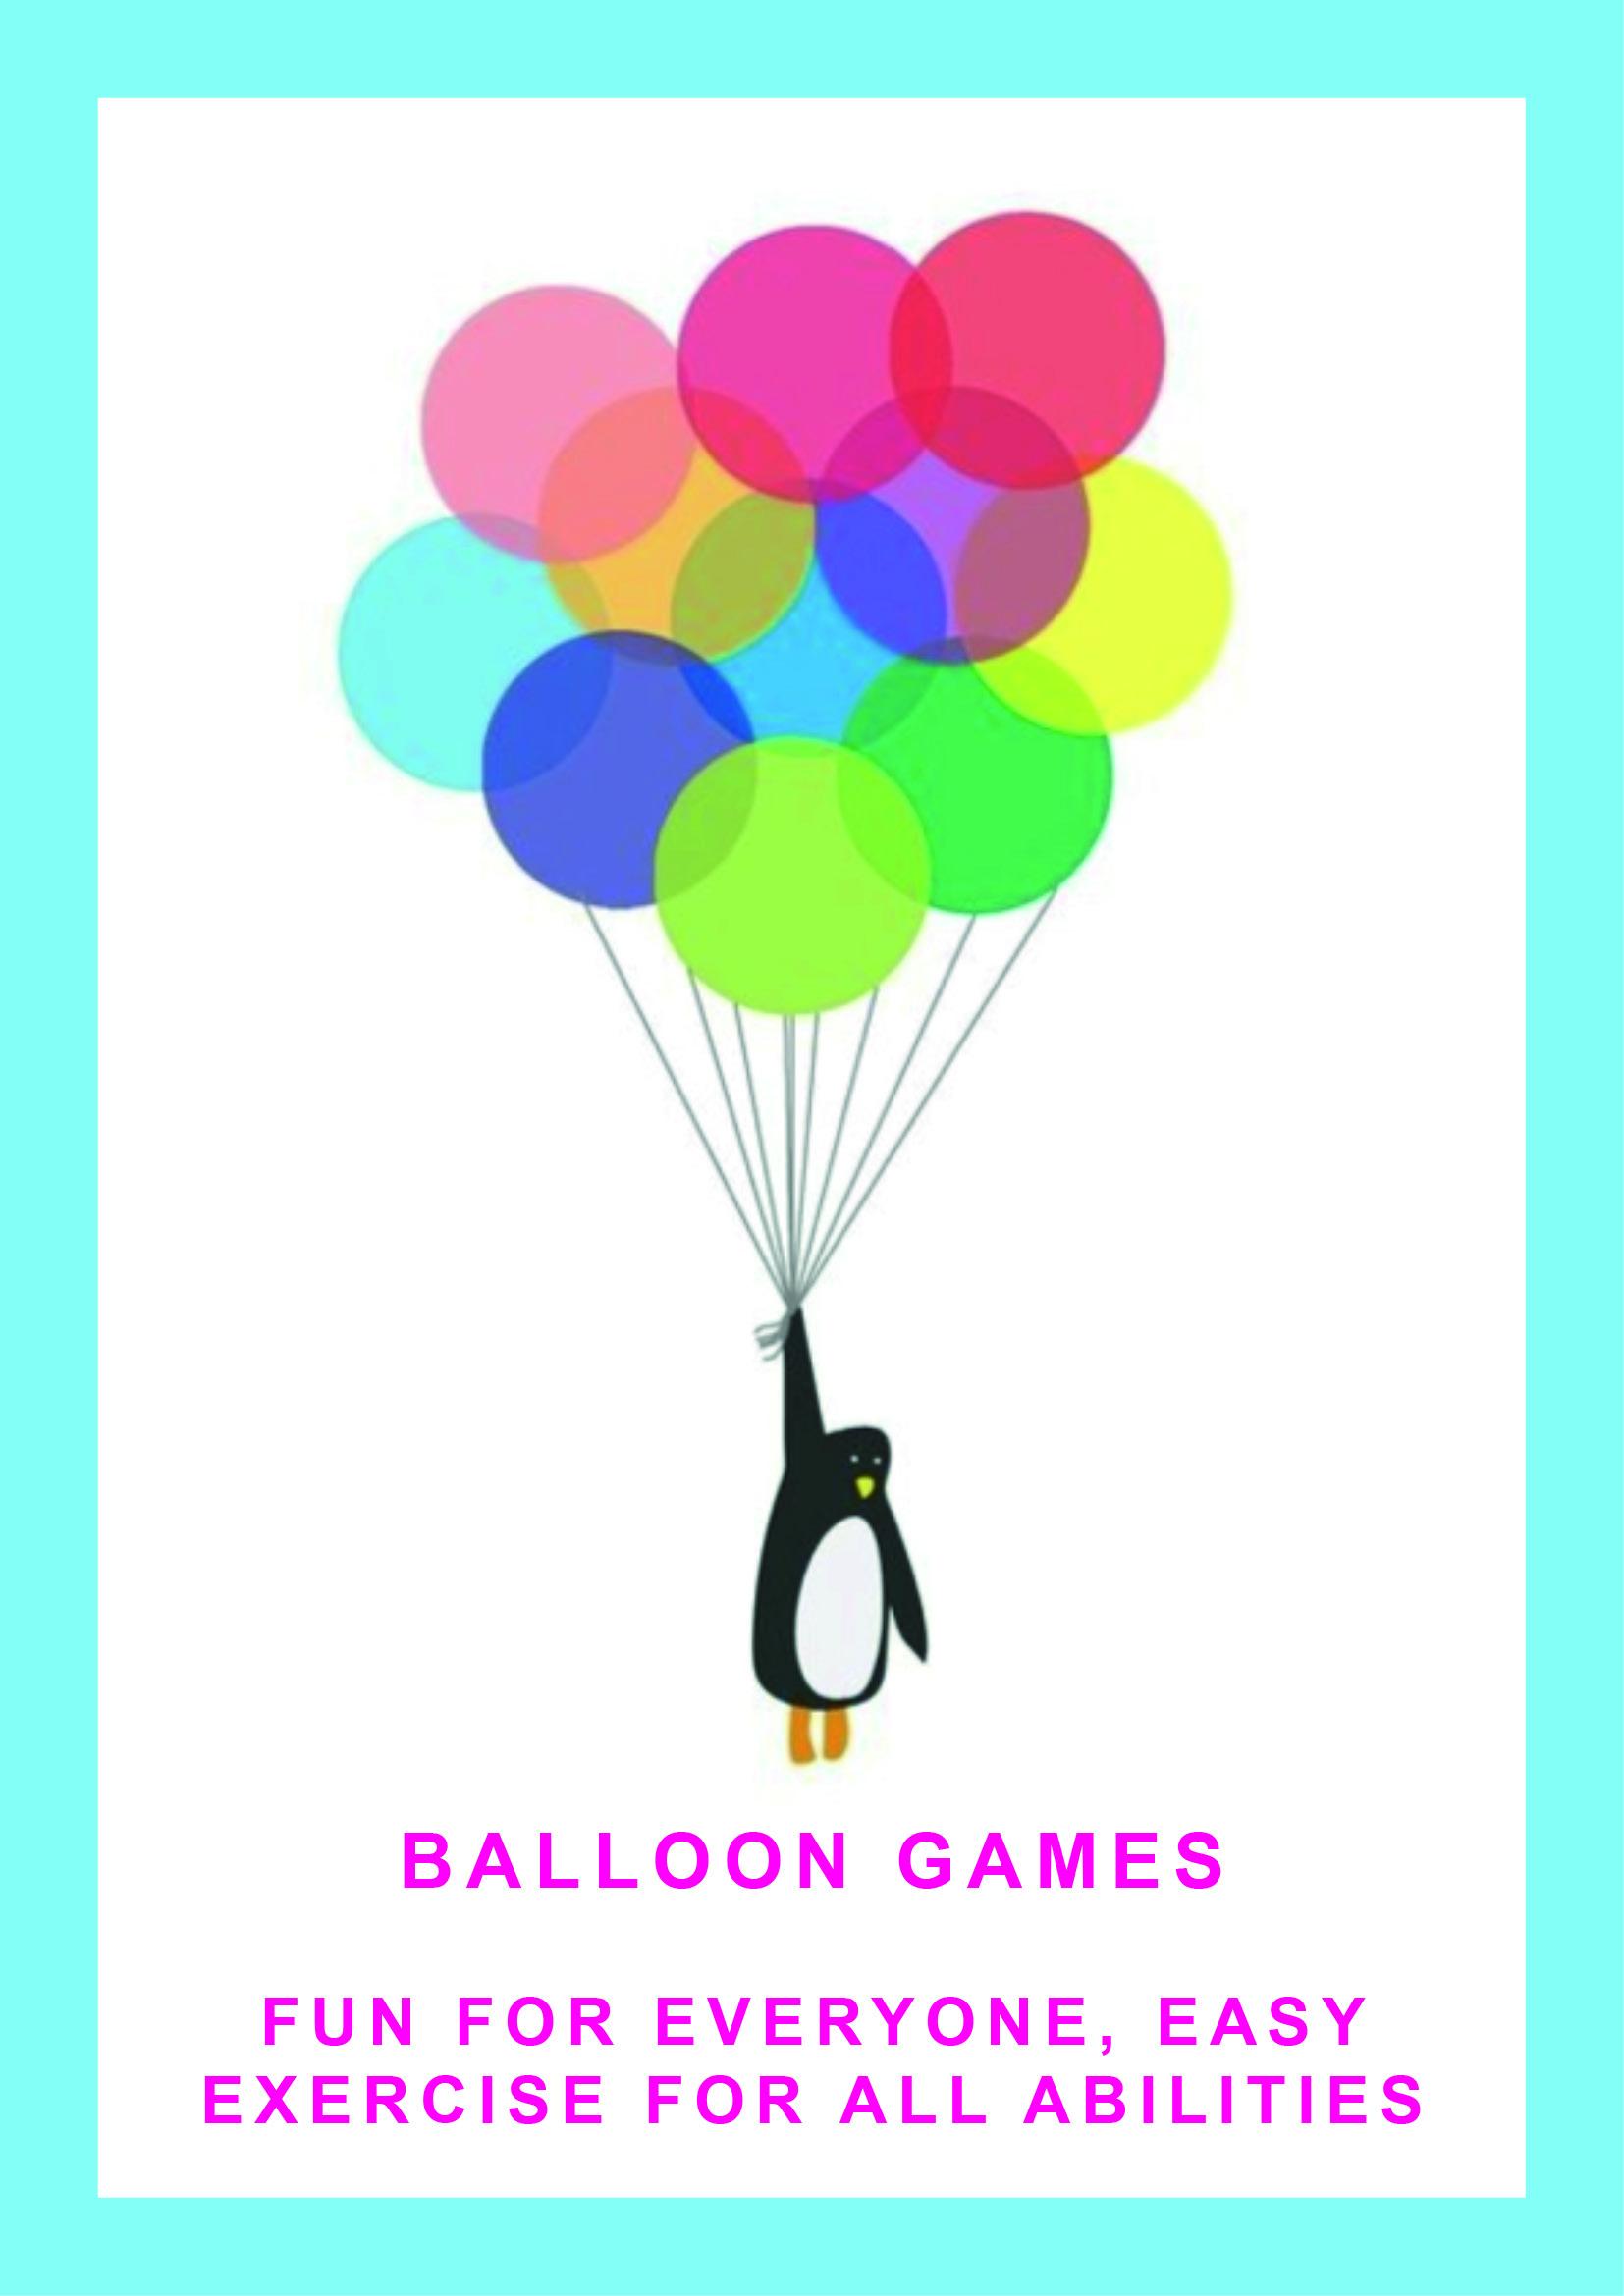 balloon games poster